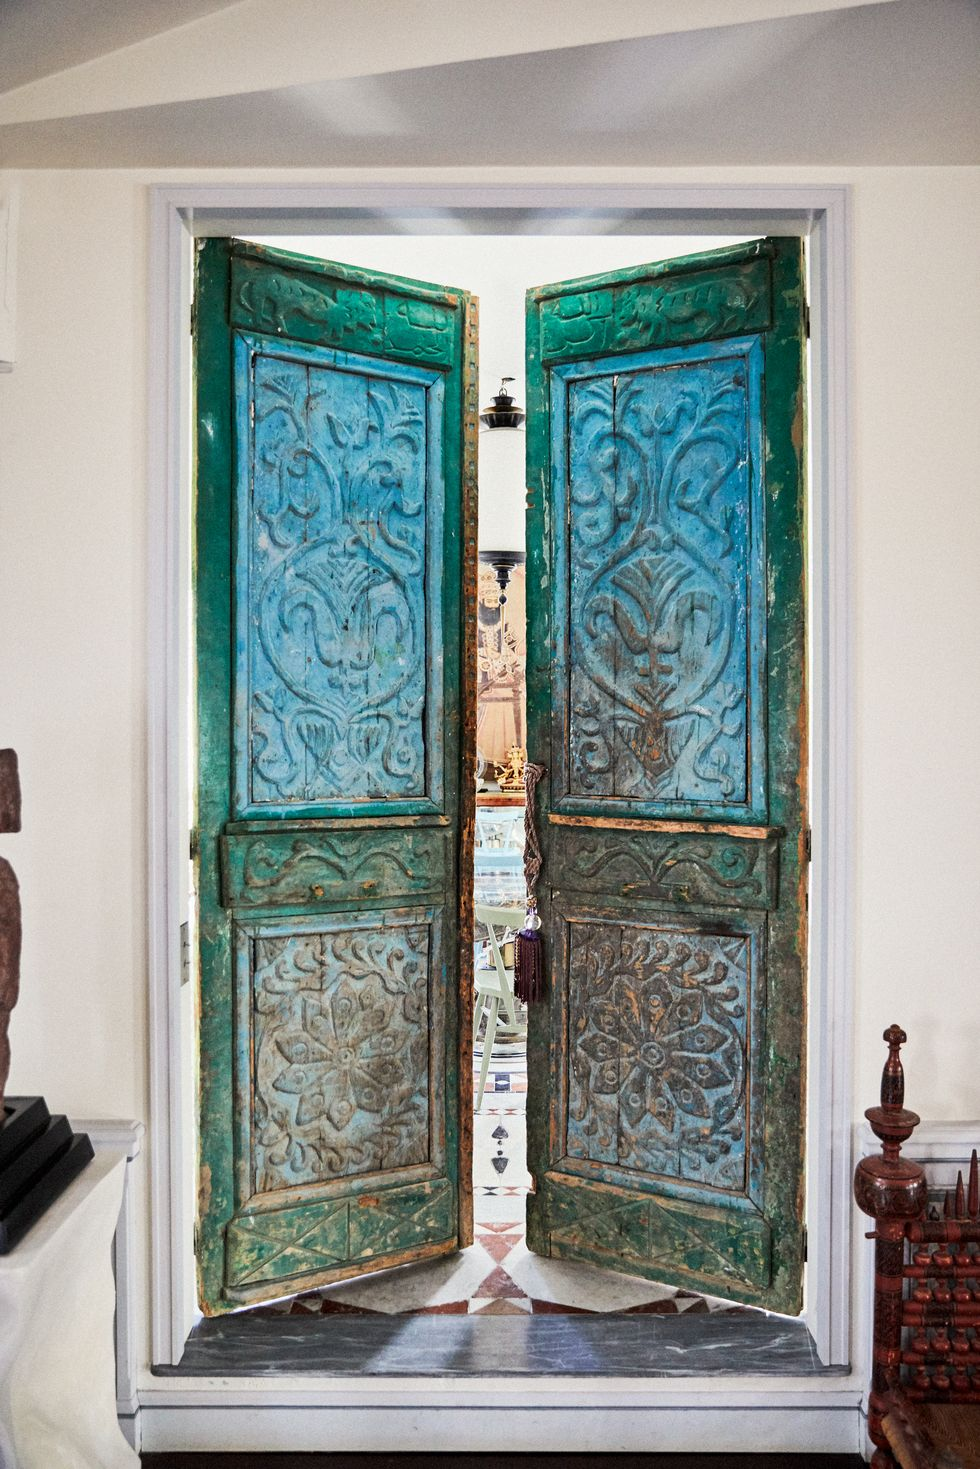 Celebrity Lifestyle Step Inside Christian Louboutin's Parisian Home (1)